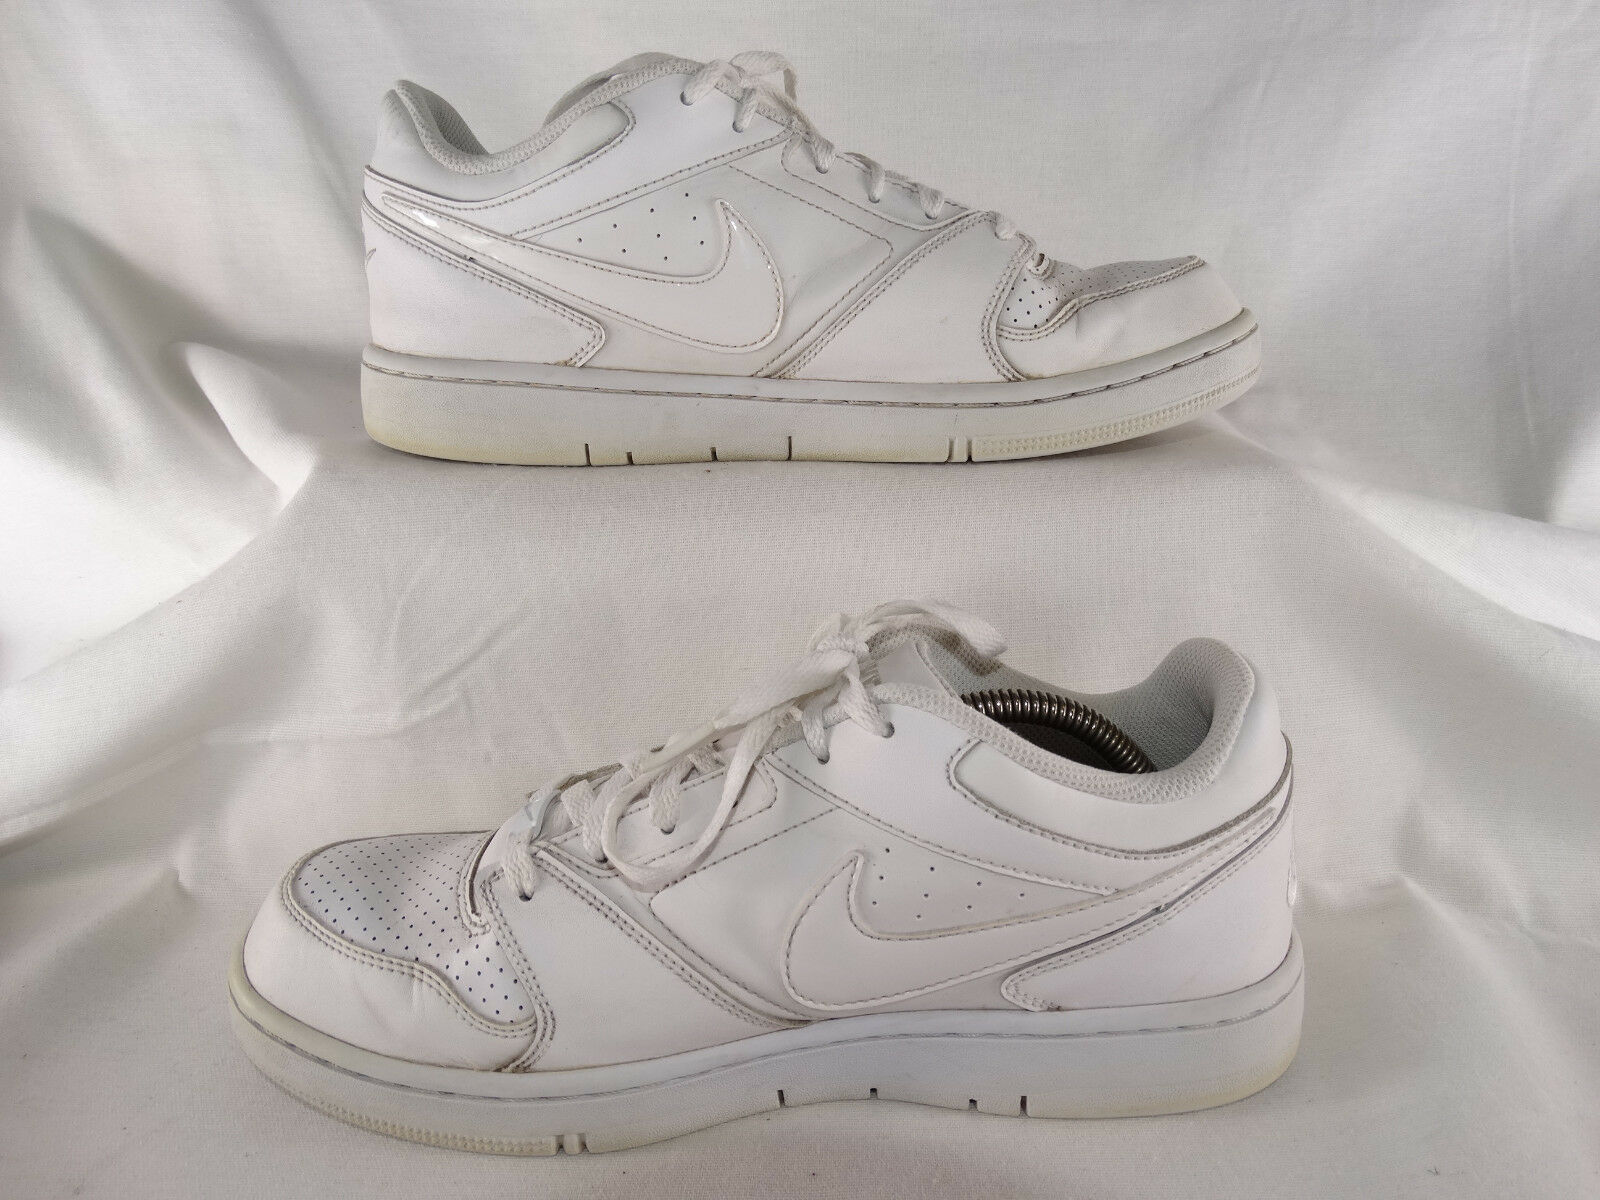 Nike Prestige IV Low Low Low Basketballschuhe 488428-111 Turnschuhe weiß EU 42,5 US 9 ee70dd